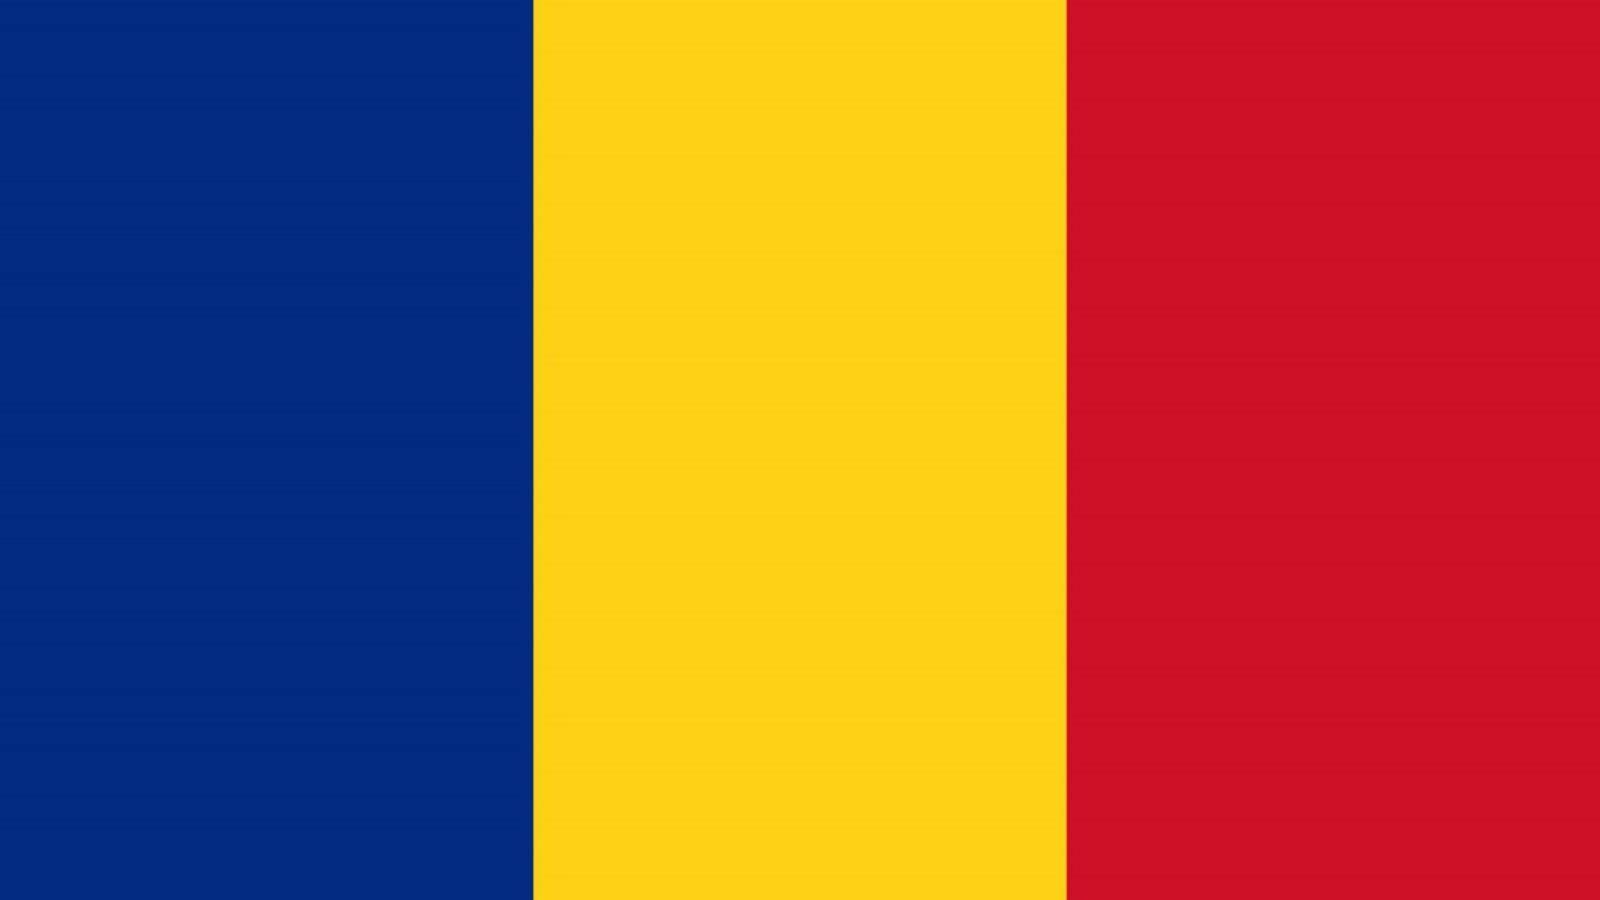 Coronavirus Romania 5.6 Milioane de Oameni Vaccinati cu Schema Completa